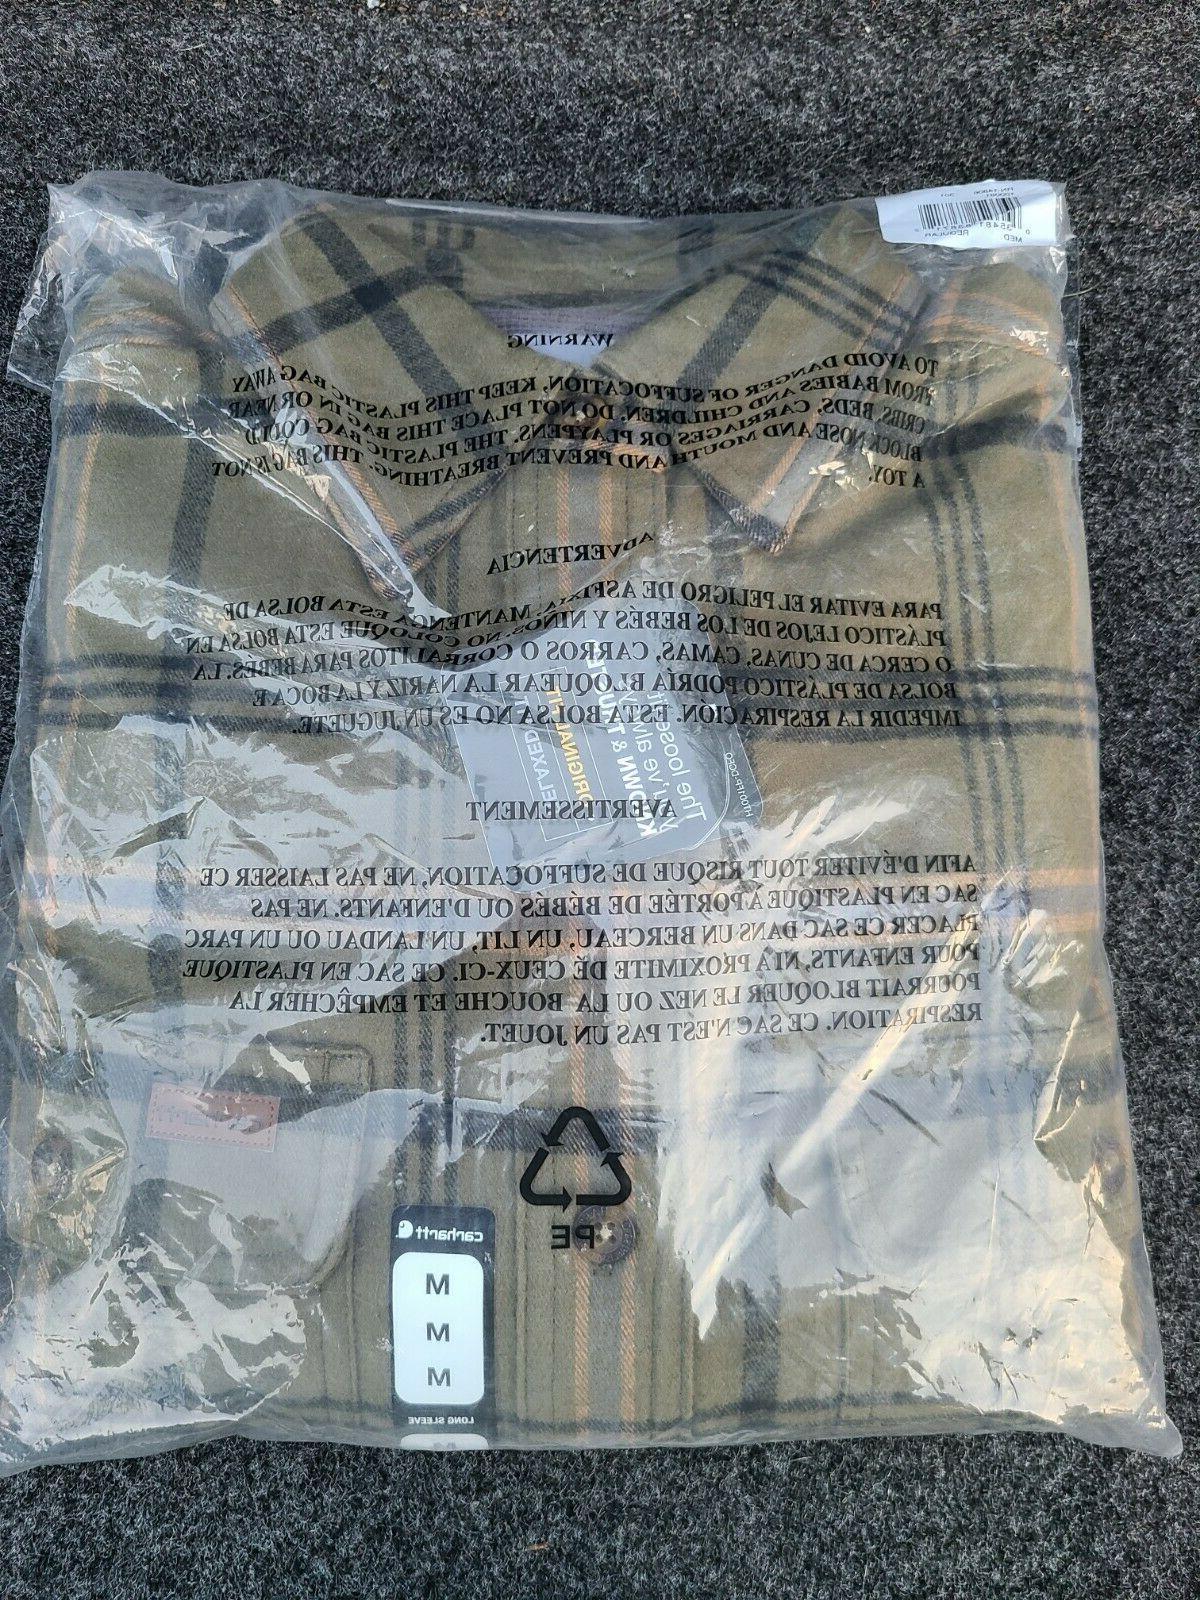 Carhartt Sleeve Cotton 100% Pocket Shirts Flannel